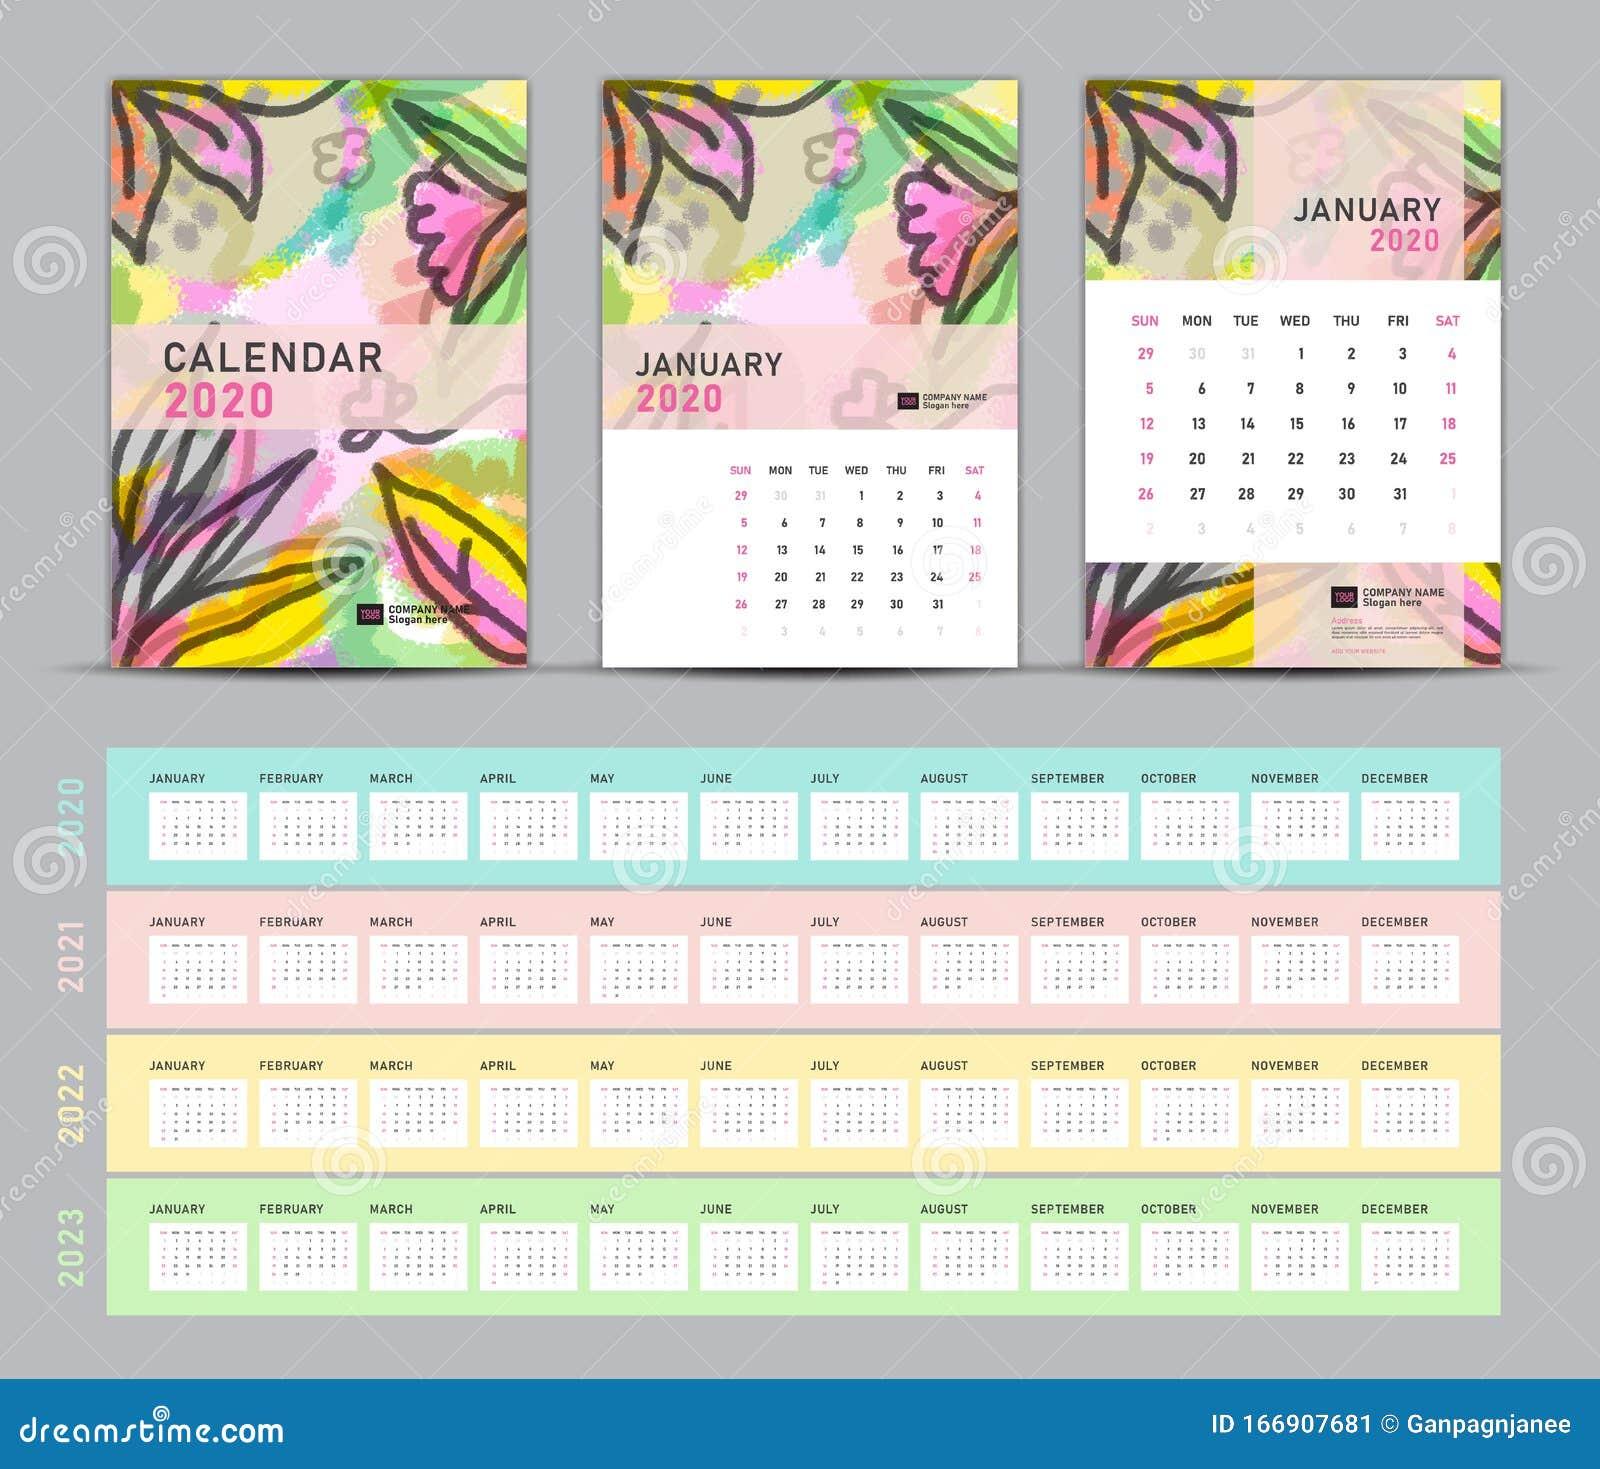 2022 Calendar Cover.Calendar 2020 2021 2022 2023 Template Desk Calendar 2020 Vector Cover Design On Flower Painting Background Set Of 12 Months Stock Vector Illustration Of Brochure Media 166907681